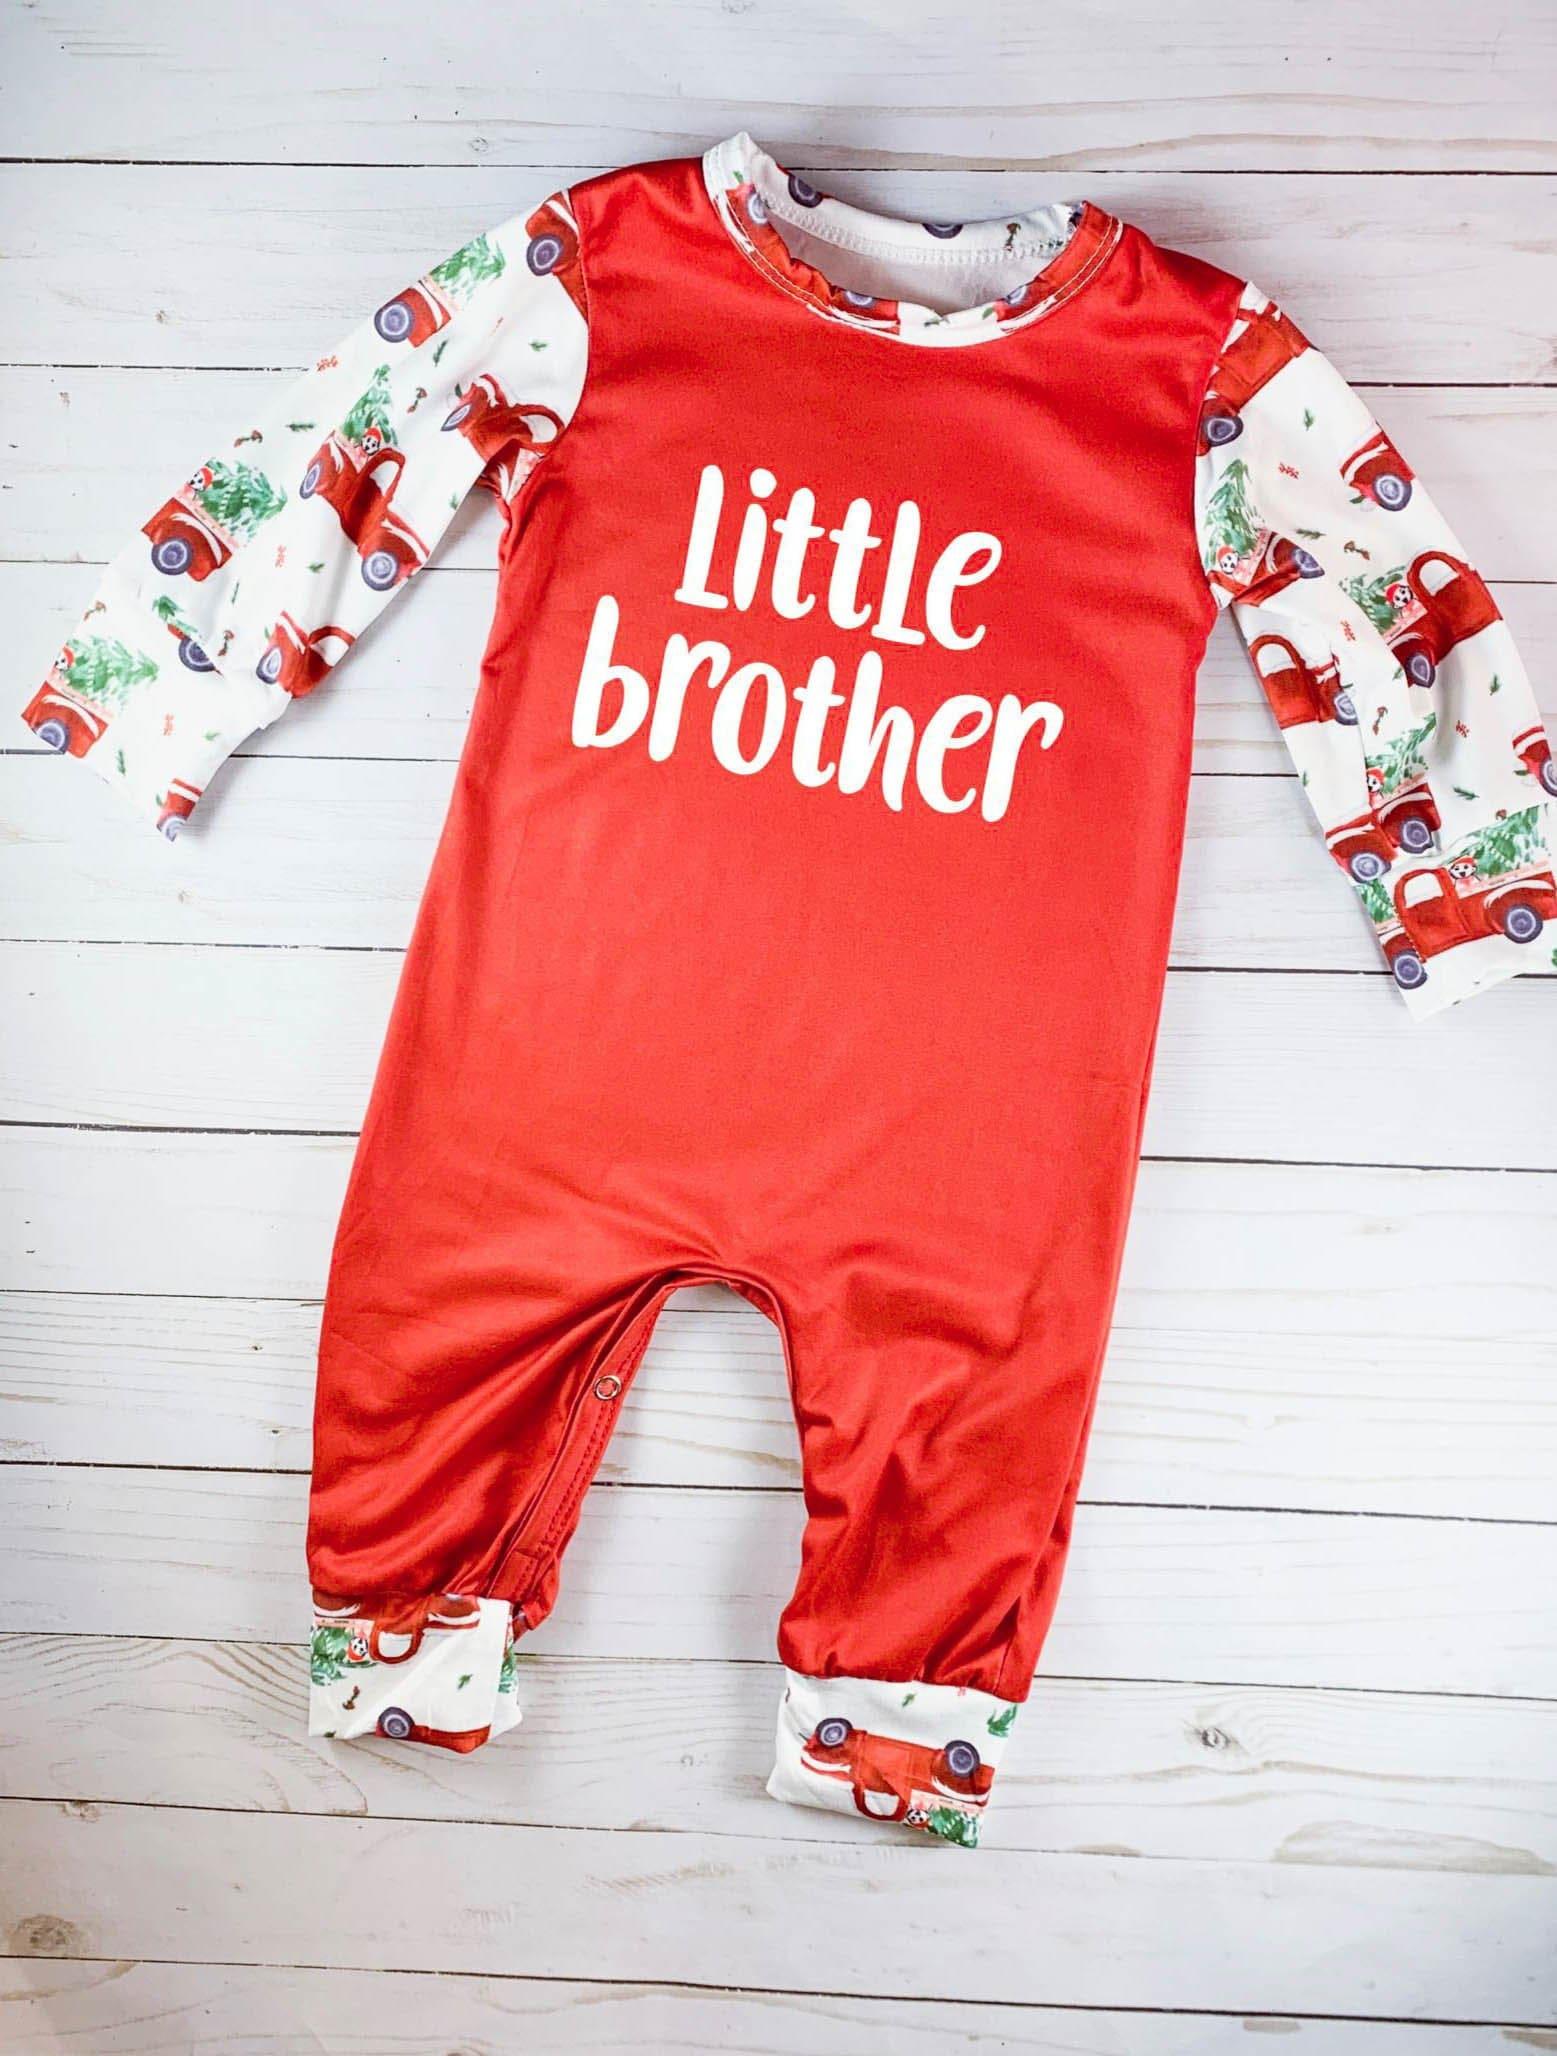 c683f24d5641a Bébé garçon Noël tenue bébé premier Noël petite frère tenue